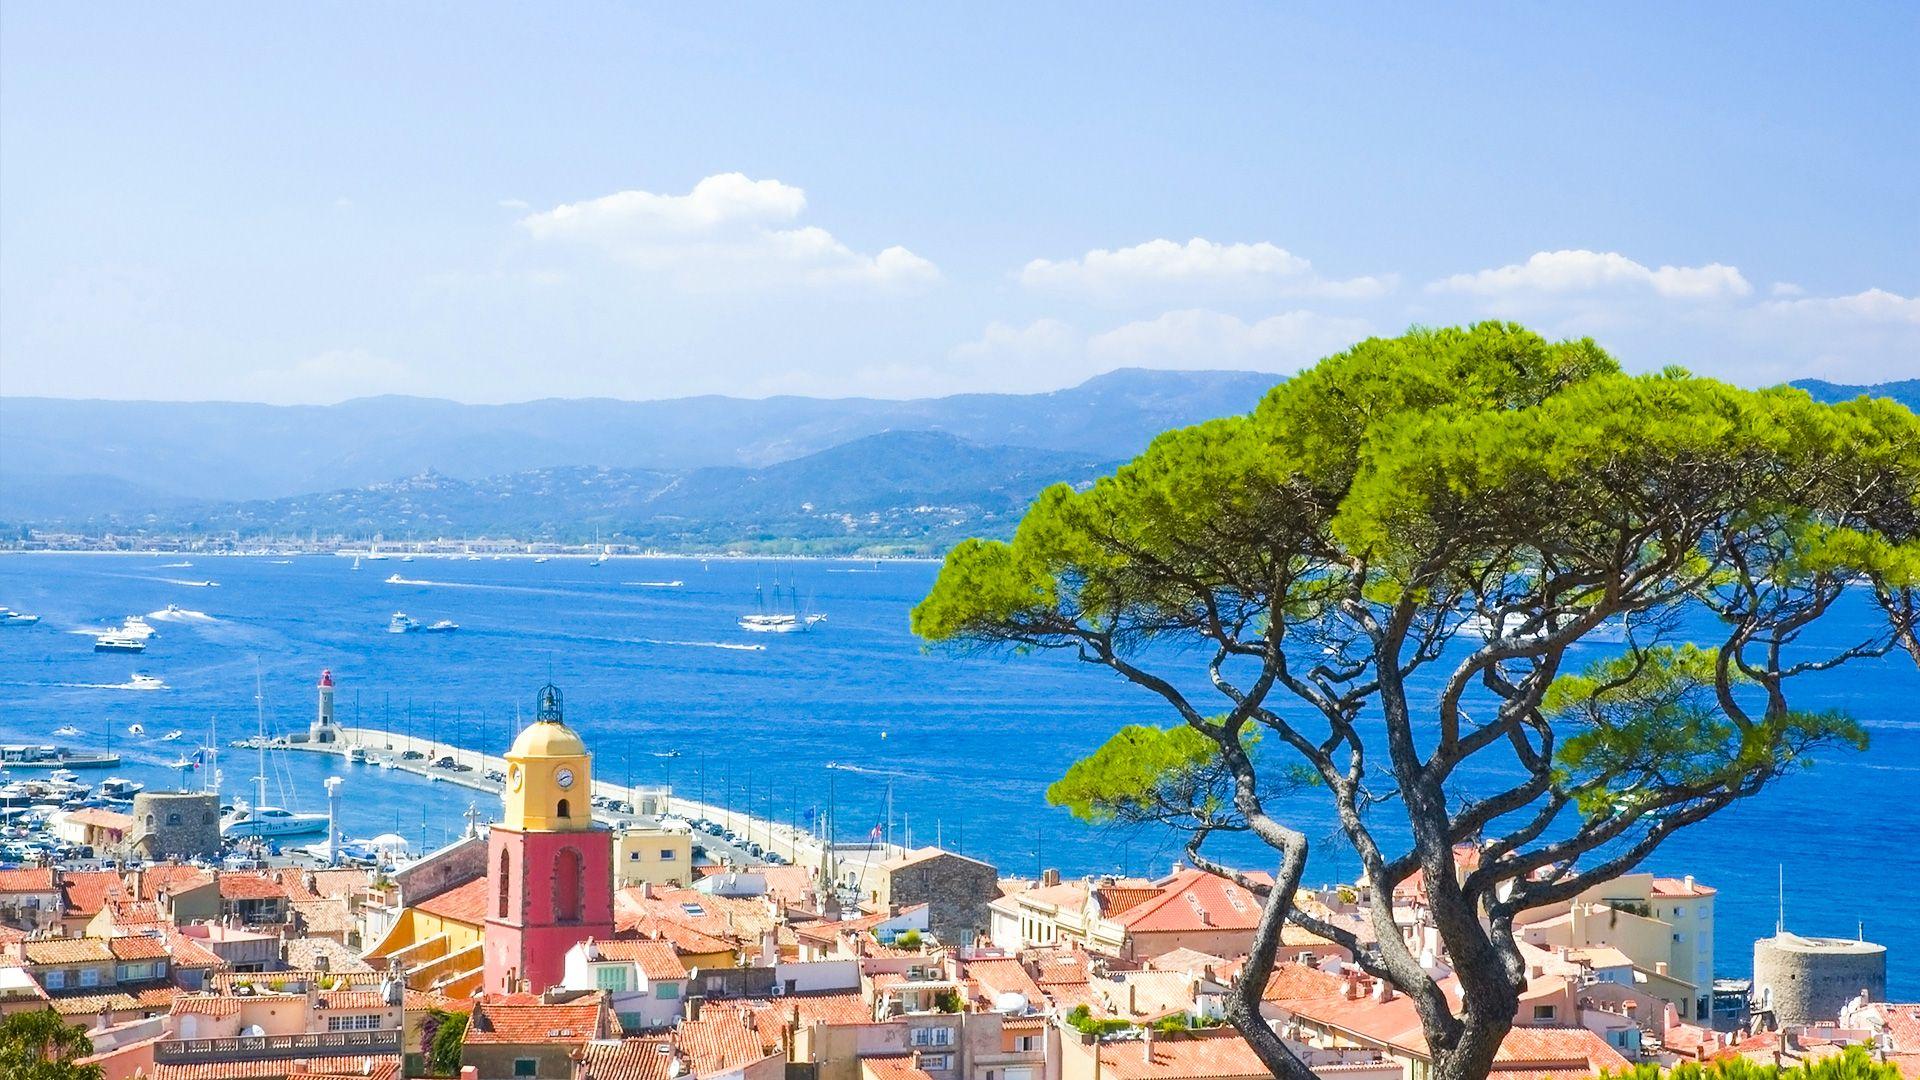 St Tropez France Wallpapers   Top St Tropez France 1920x1080